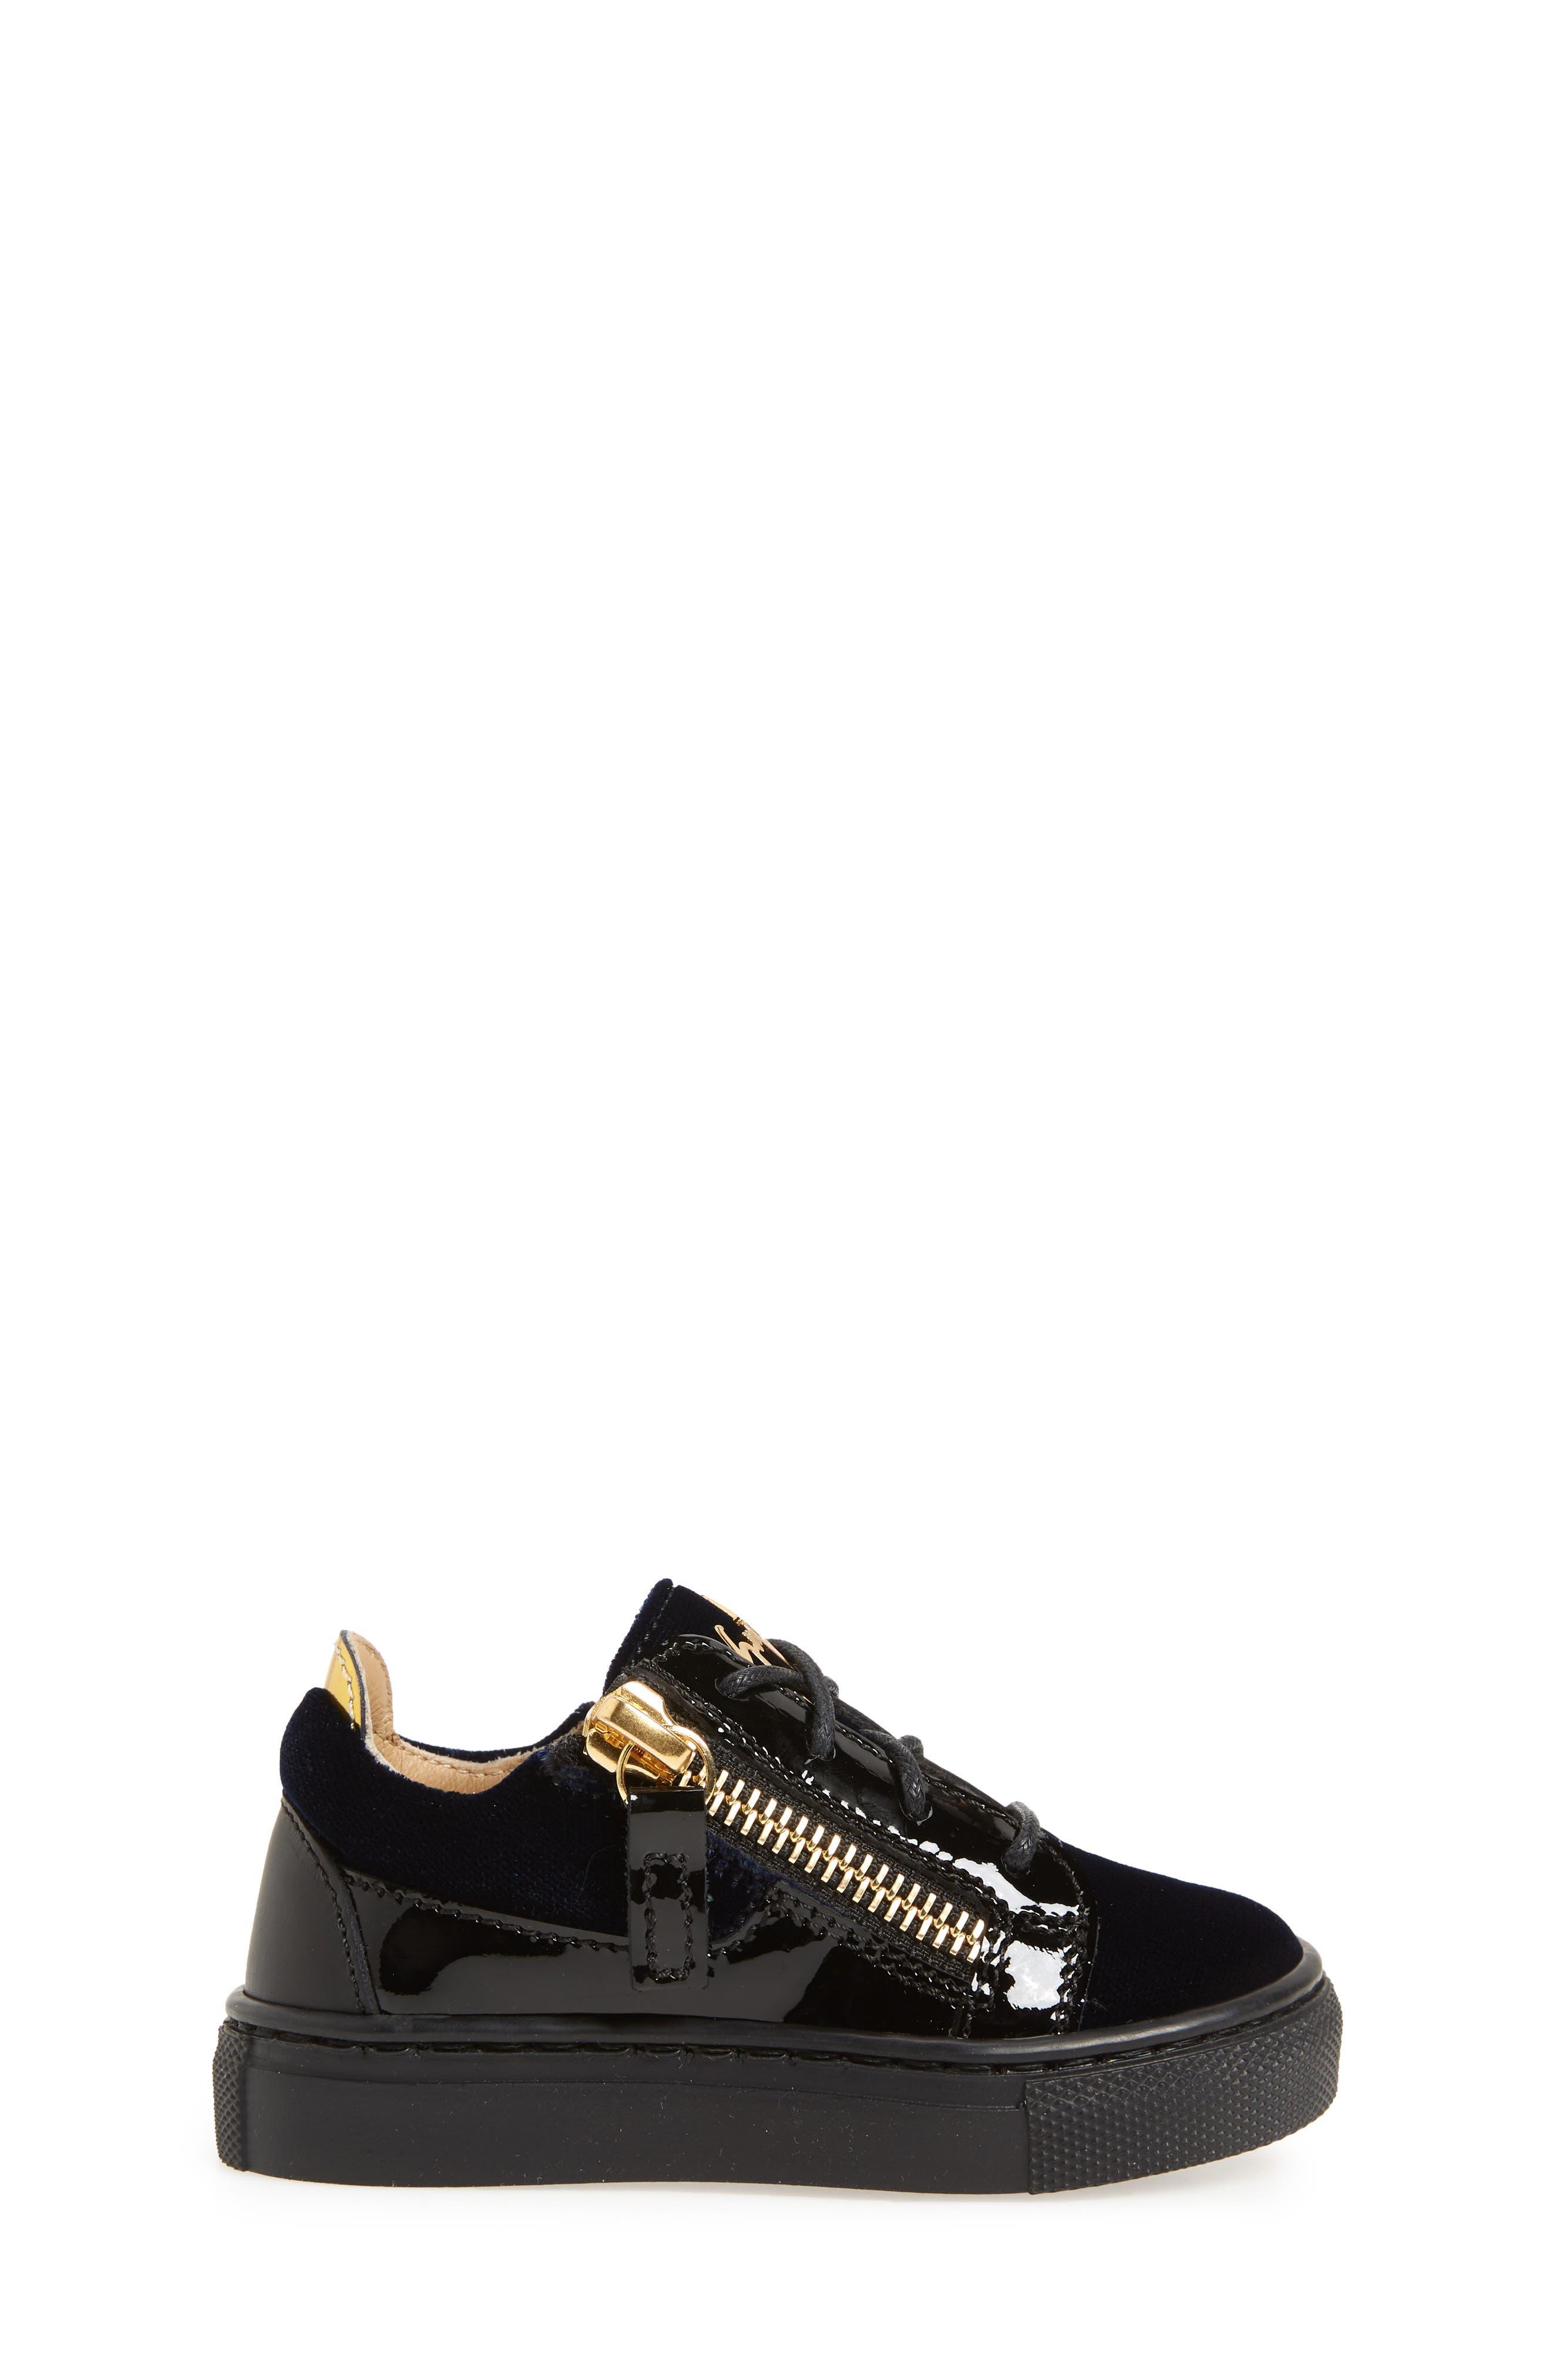 London Sneaker,                             Alternate thumbnail 3, color,                             410